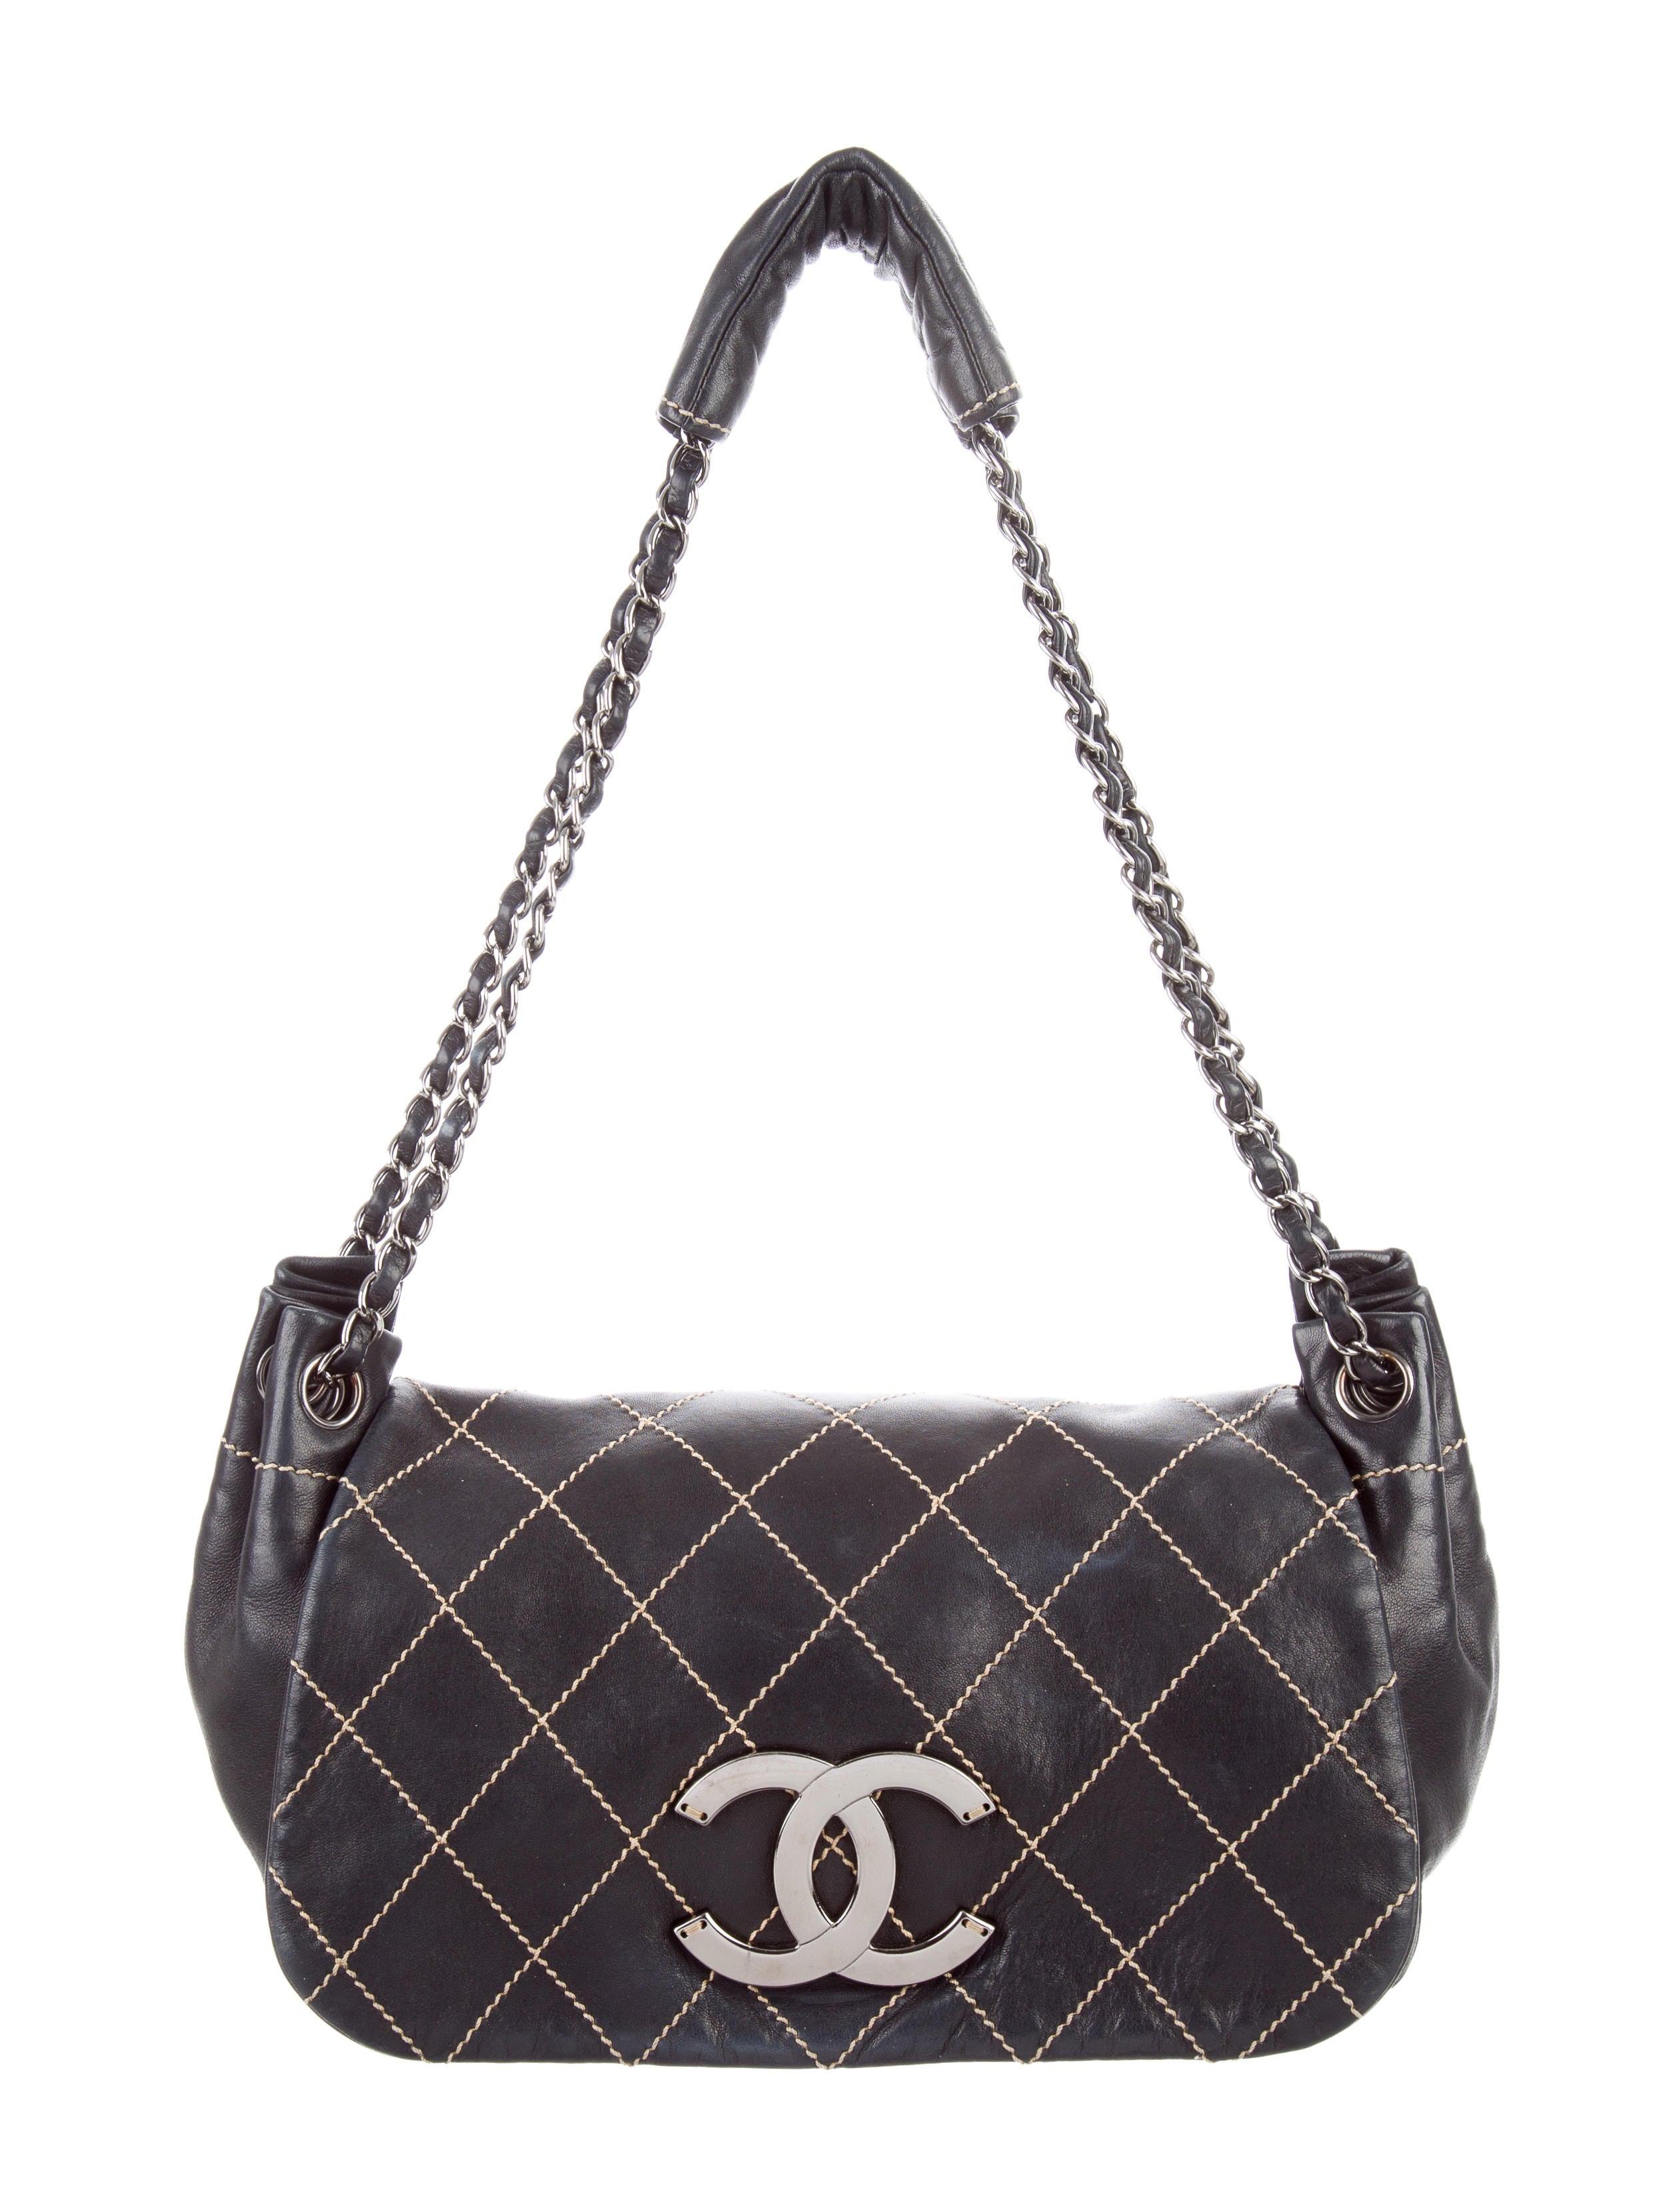 804c927a60eaa2 Chanel Surpique Accordion Flap Bag - Handbags - CHA207048 | The RealReal